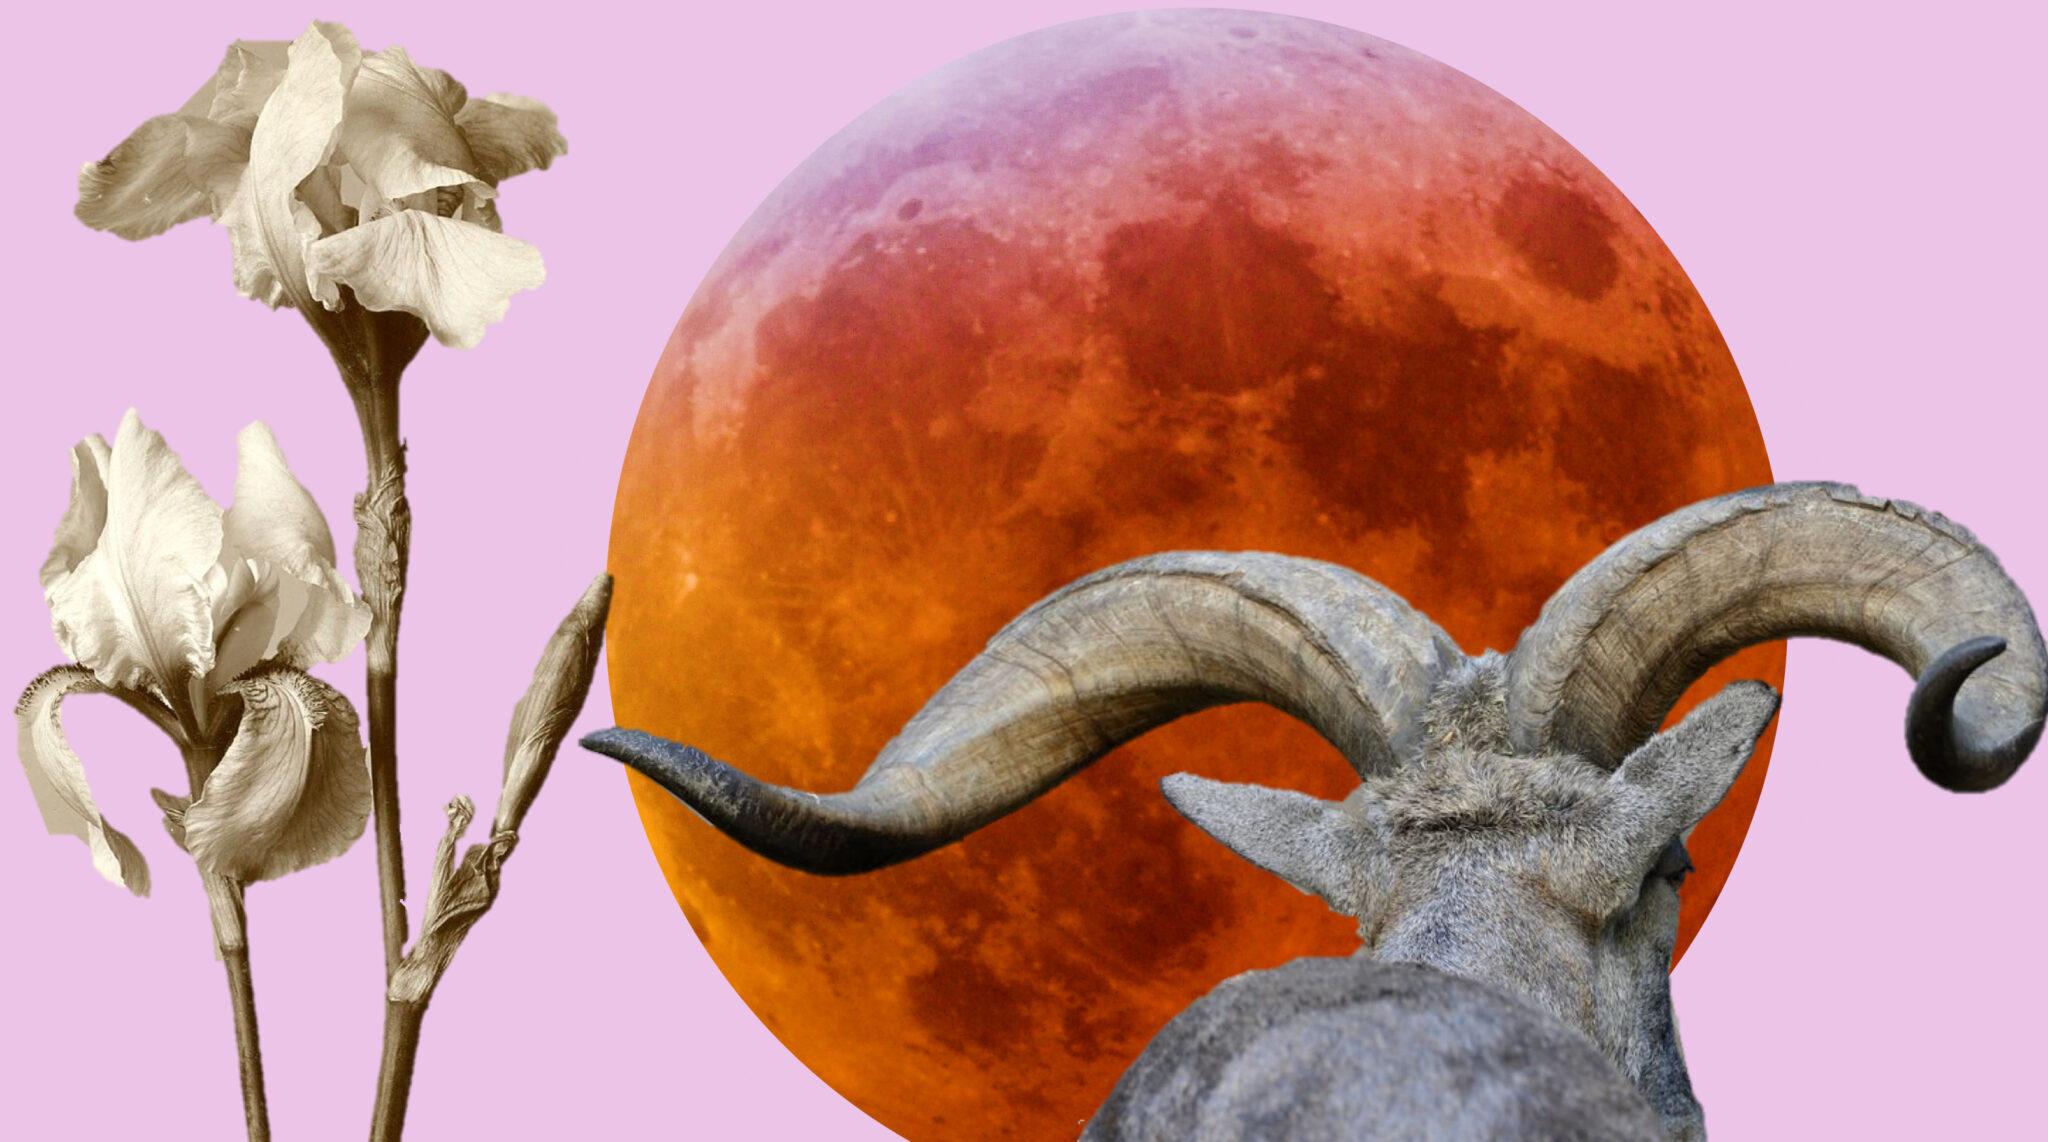 July 5 2020 - Full Moon